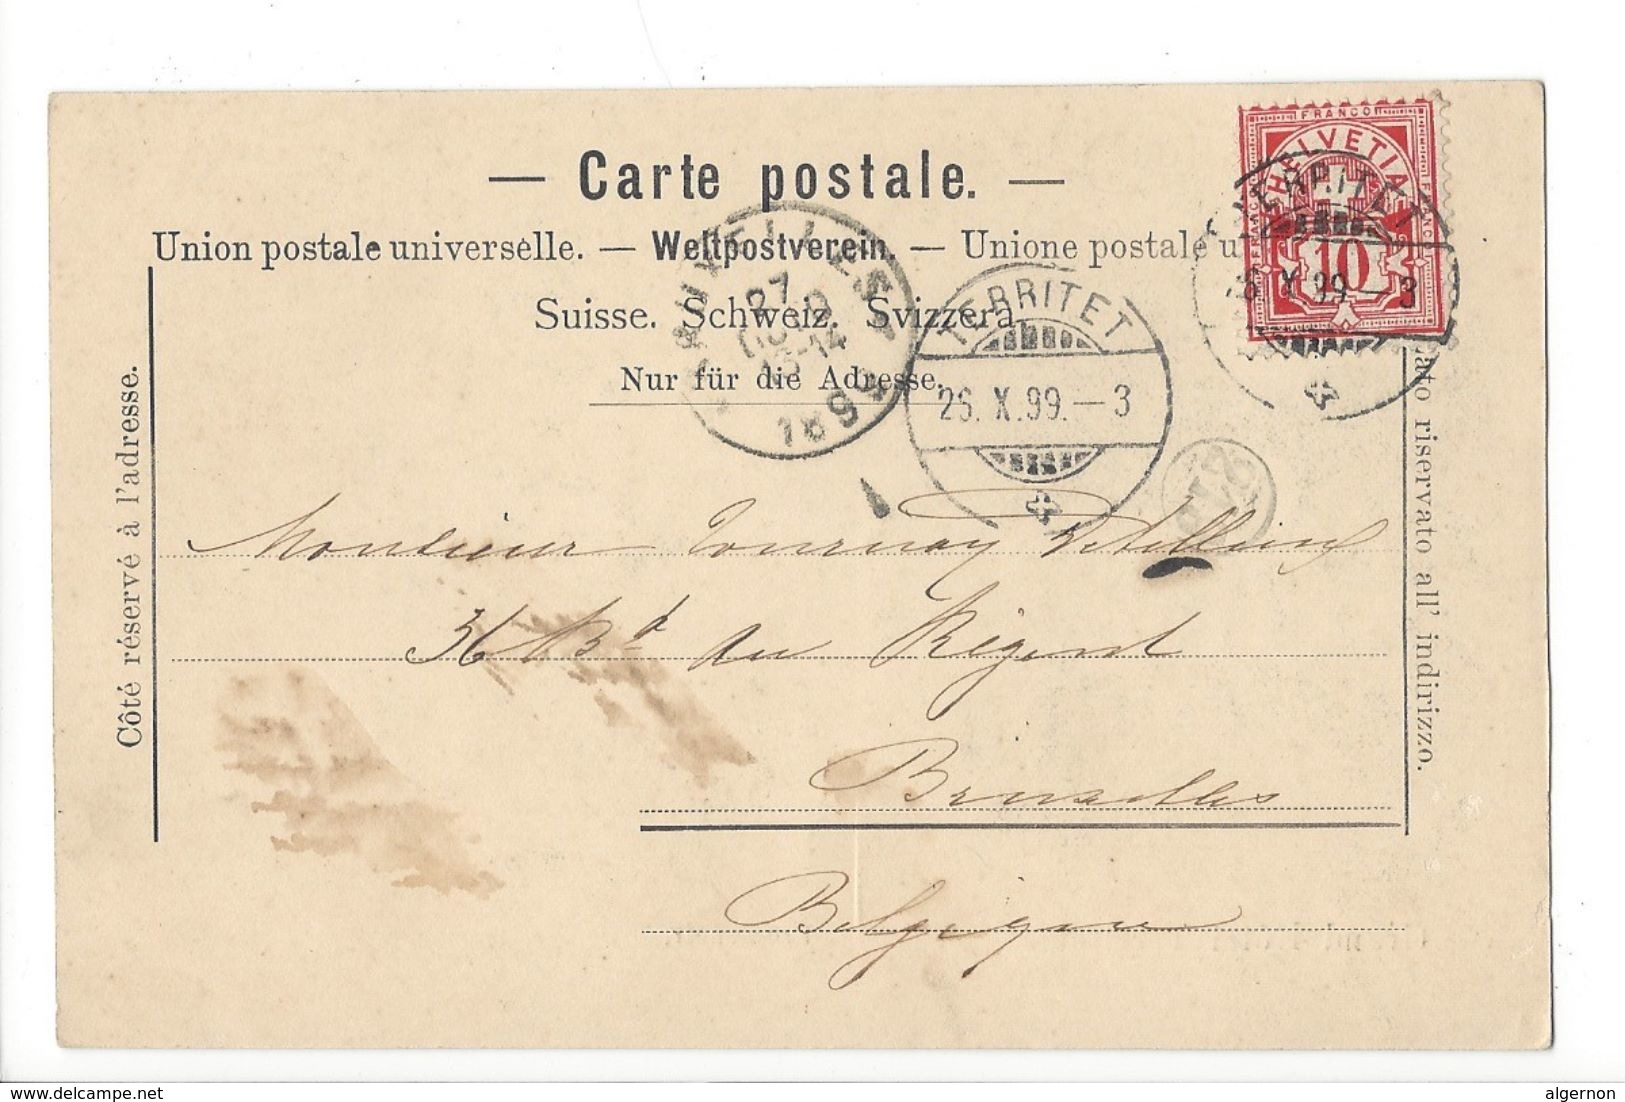 18976 - Grand Hôtel Territet Promenoir Circulée En 1899 - VD Vaud